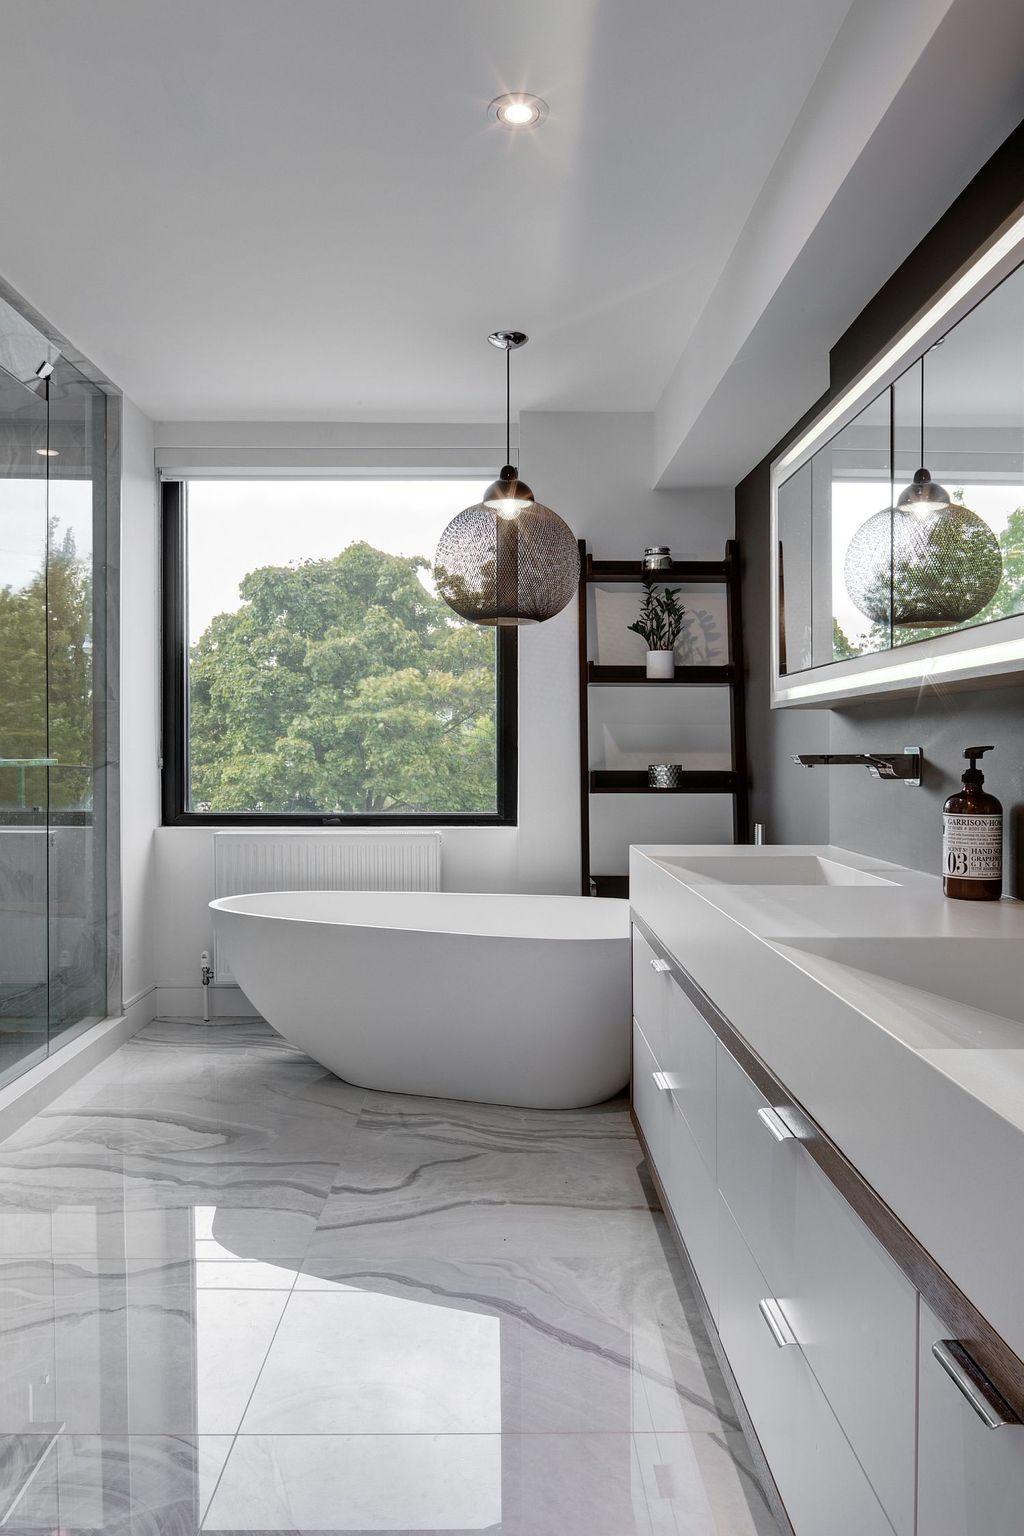 Awesome fascinating bathroom design decor ideas refresh more at https also hannatomilynn         in rh pinterest